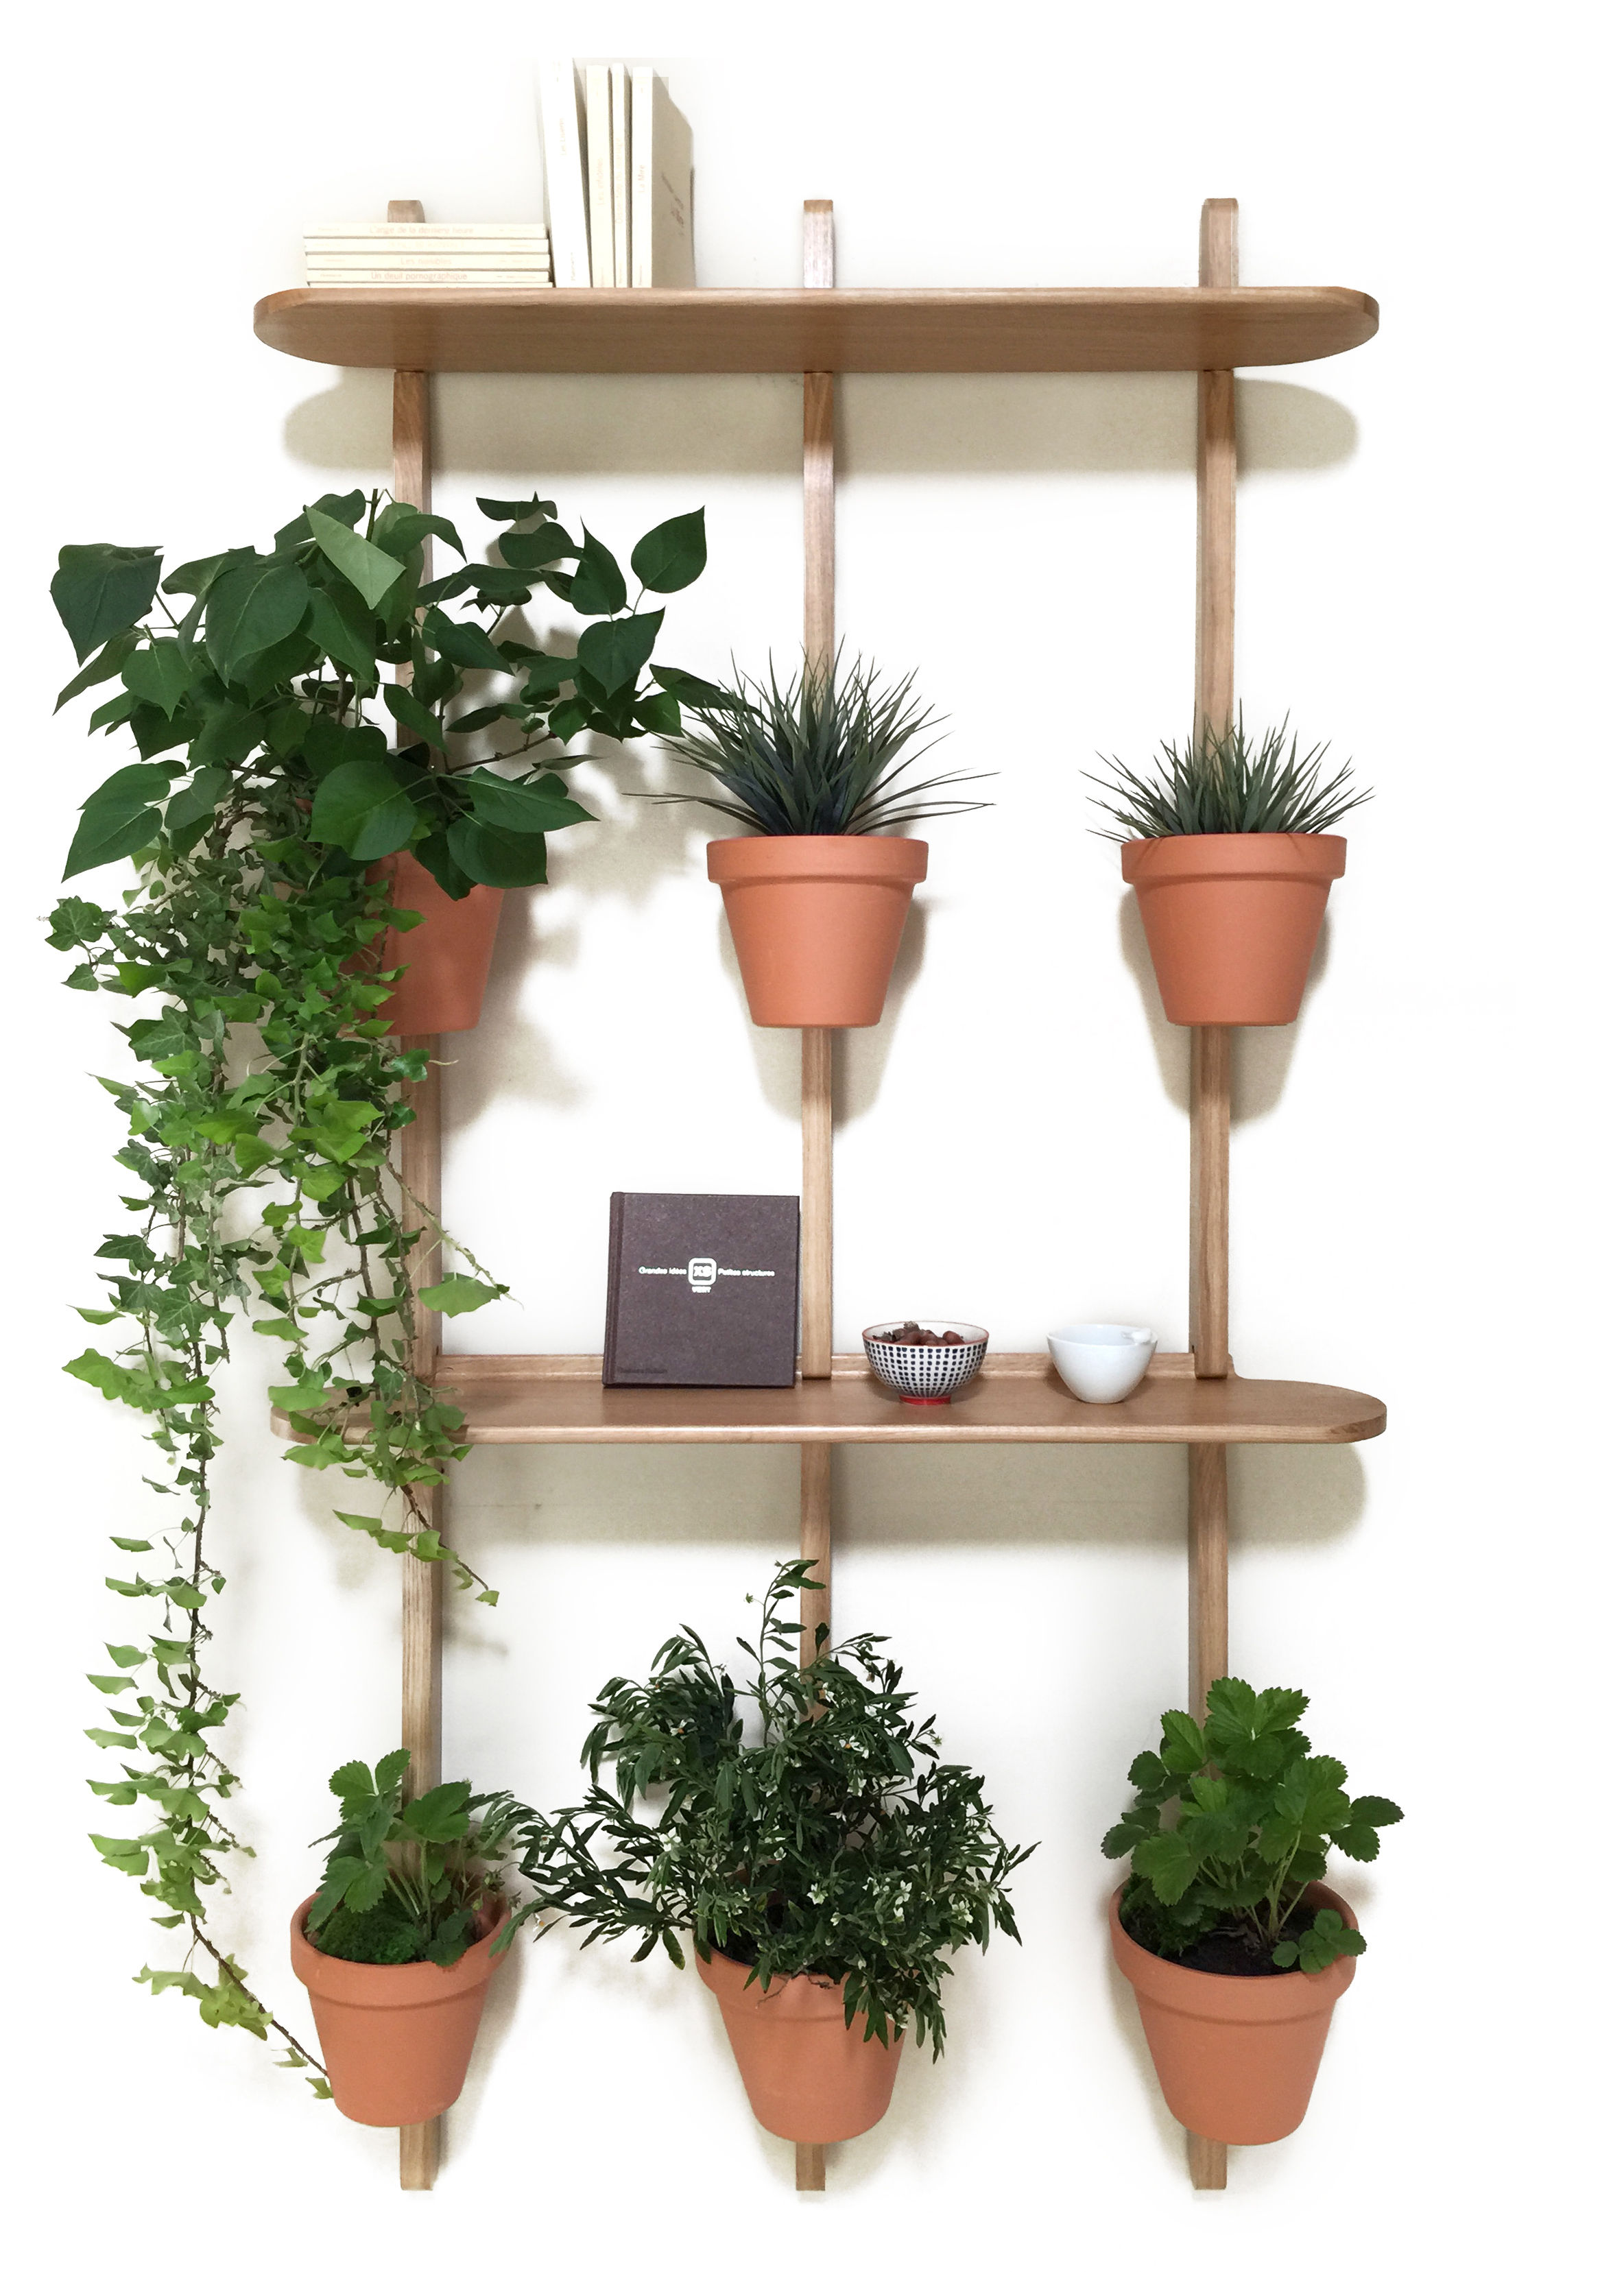 Furniture - Bookcases & Bookshelves - XPOT Shelf - / 2 round shelves L 100 cm + 3 supports H 200 cm by Compagnie - Oak - Varnished solid oak